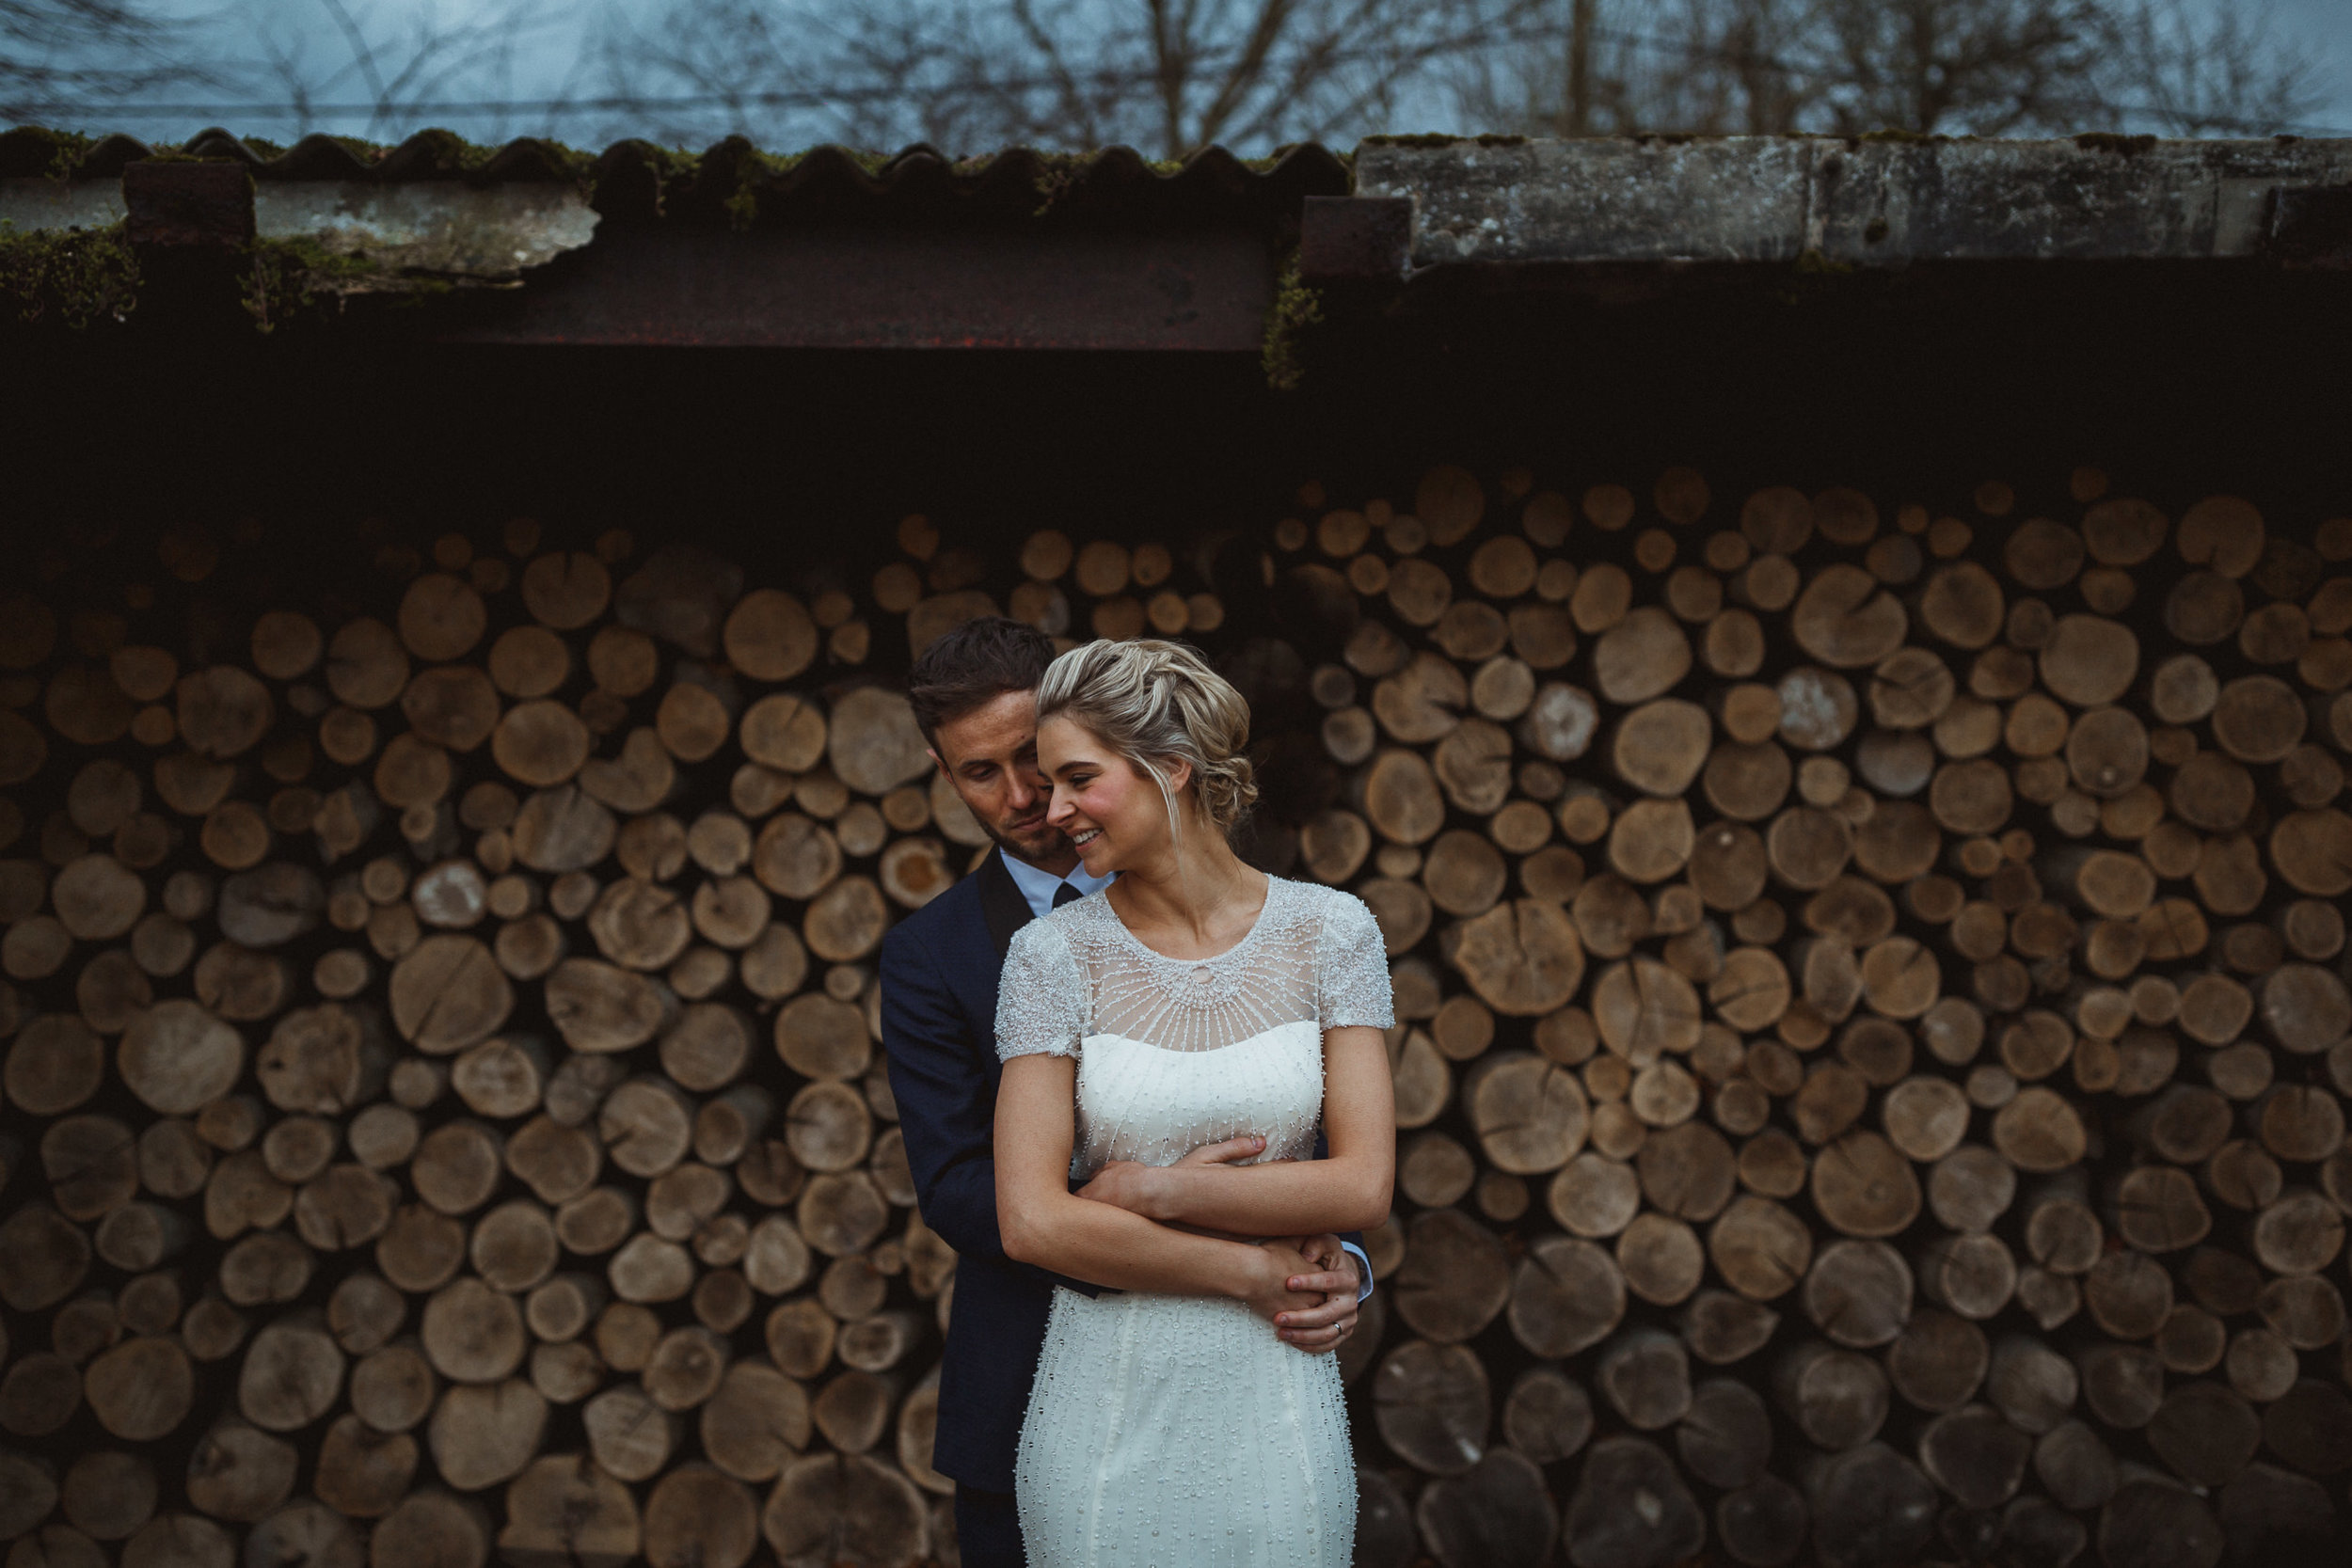 London_wedding_photographer_gione_da_silva_carelle_paul178.jpg